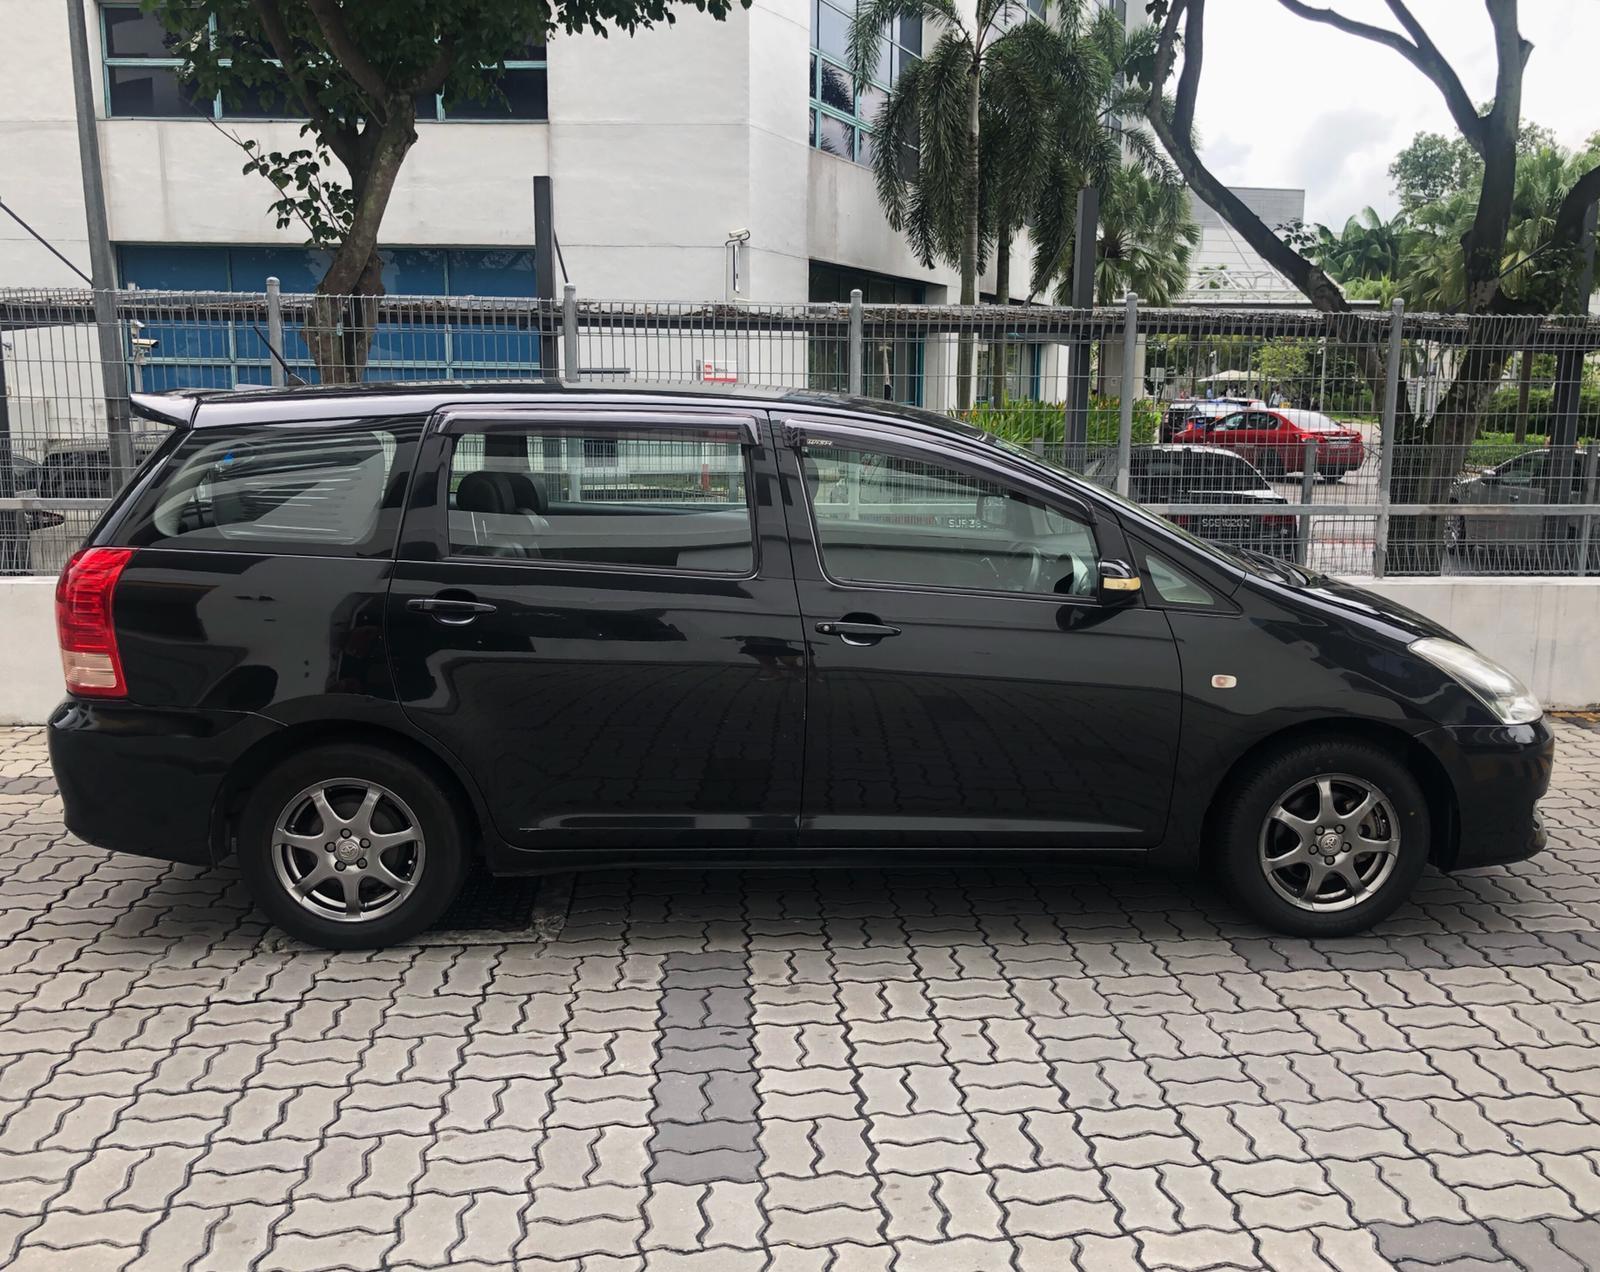 Toyota Wish Super Cheap Car Rental for Grab Gojek Ryde Personal use